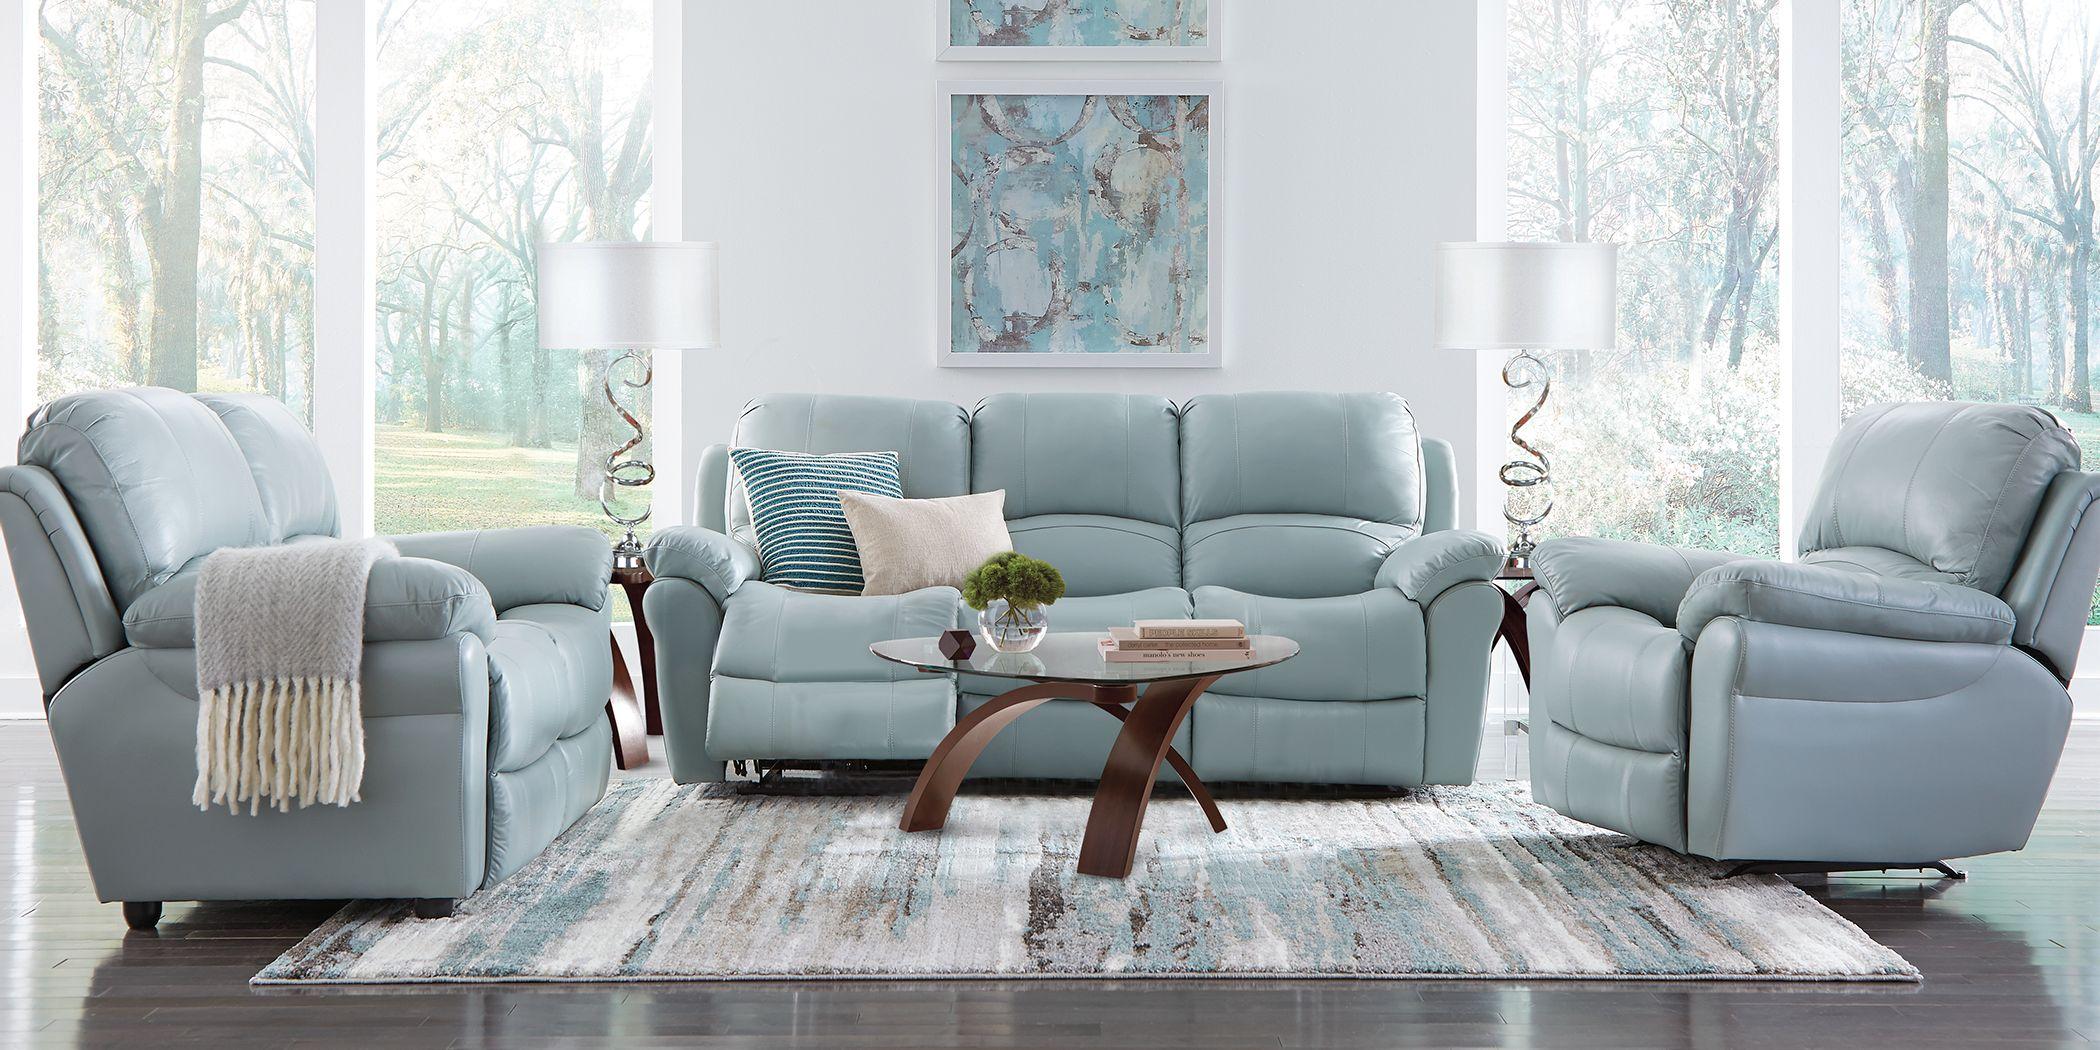 Vercelli Aqua Leather 3 Pc Living Room with Reclining Sofa